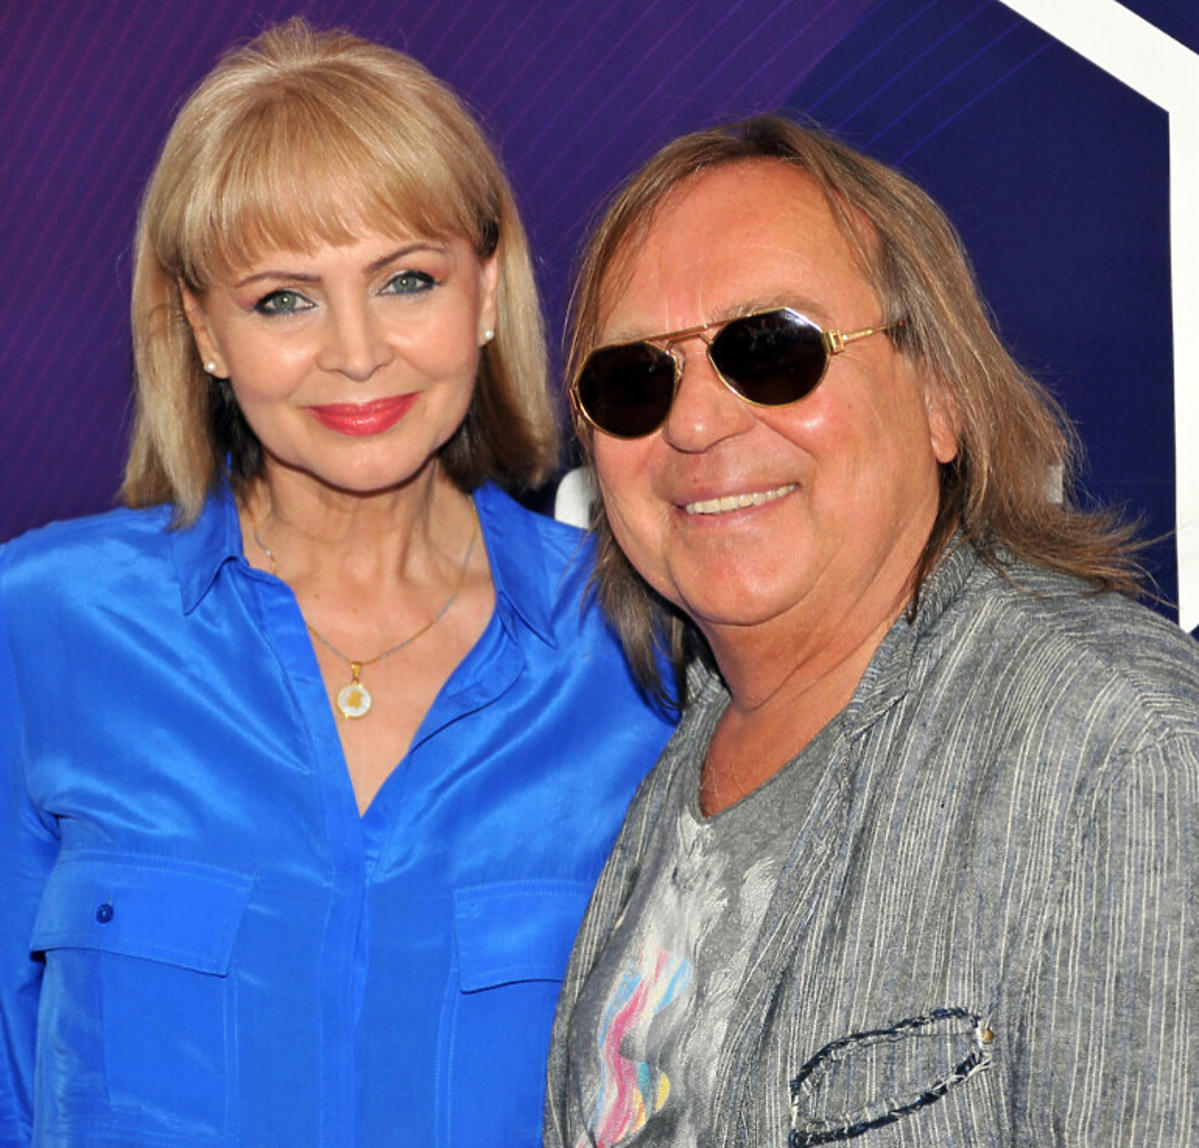 Romuald Lipko i Izabela Trojanowska